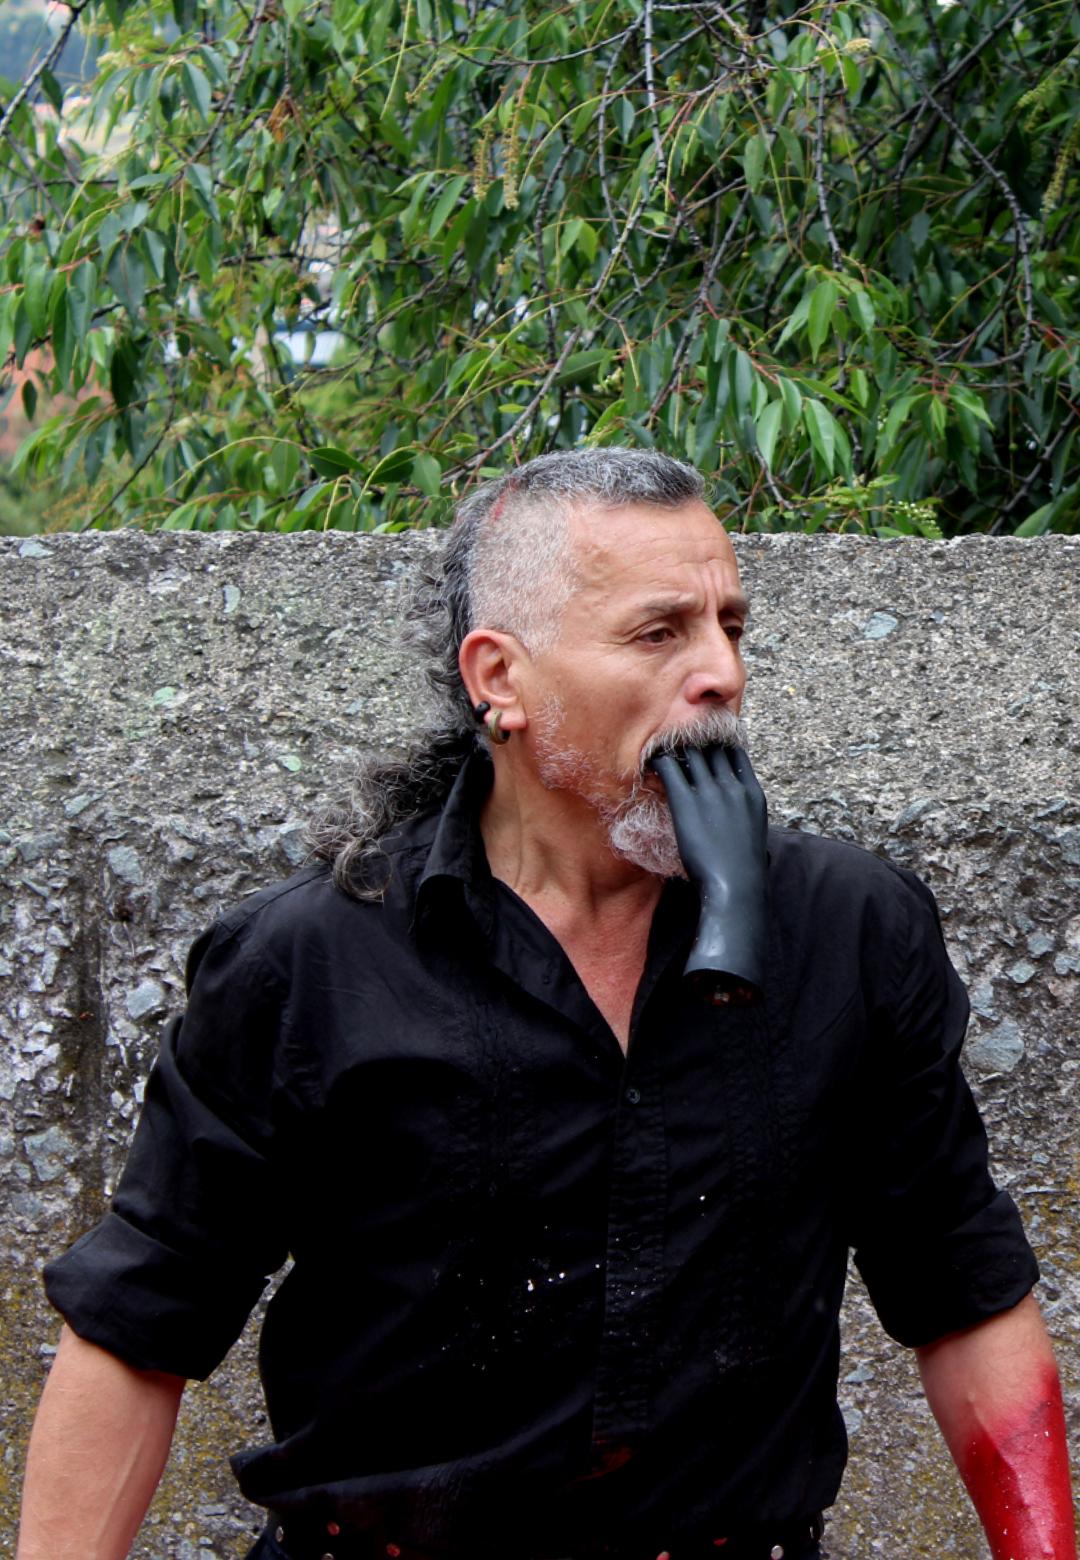 Gonzalo Rabanal at Estética de la ruina for FAAC Cuenca, Ecuador | Gonzalo Rabanal | STIR